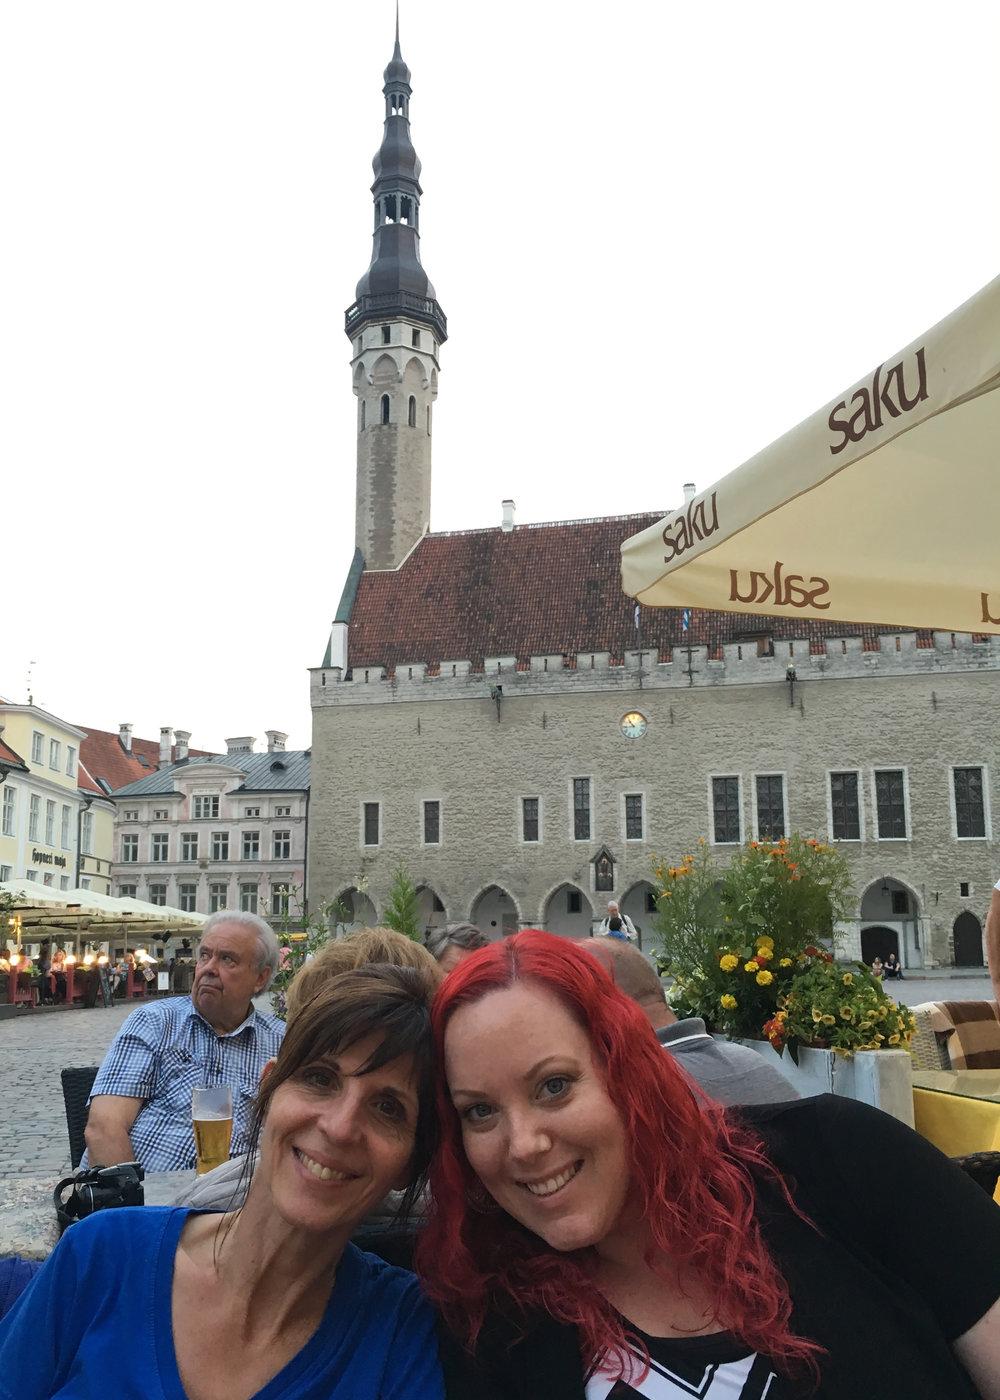 ESTONIA - Old town 2.jpg